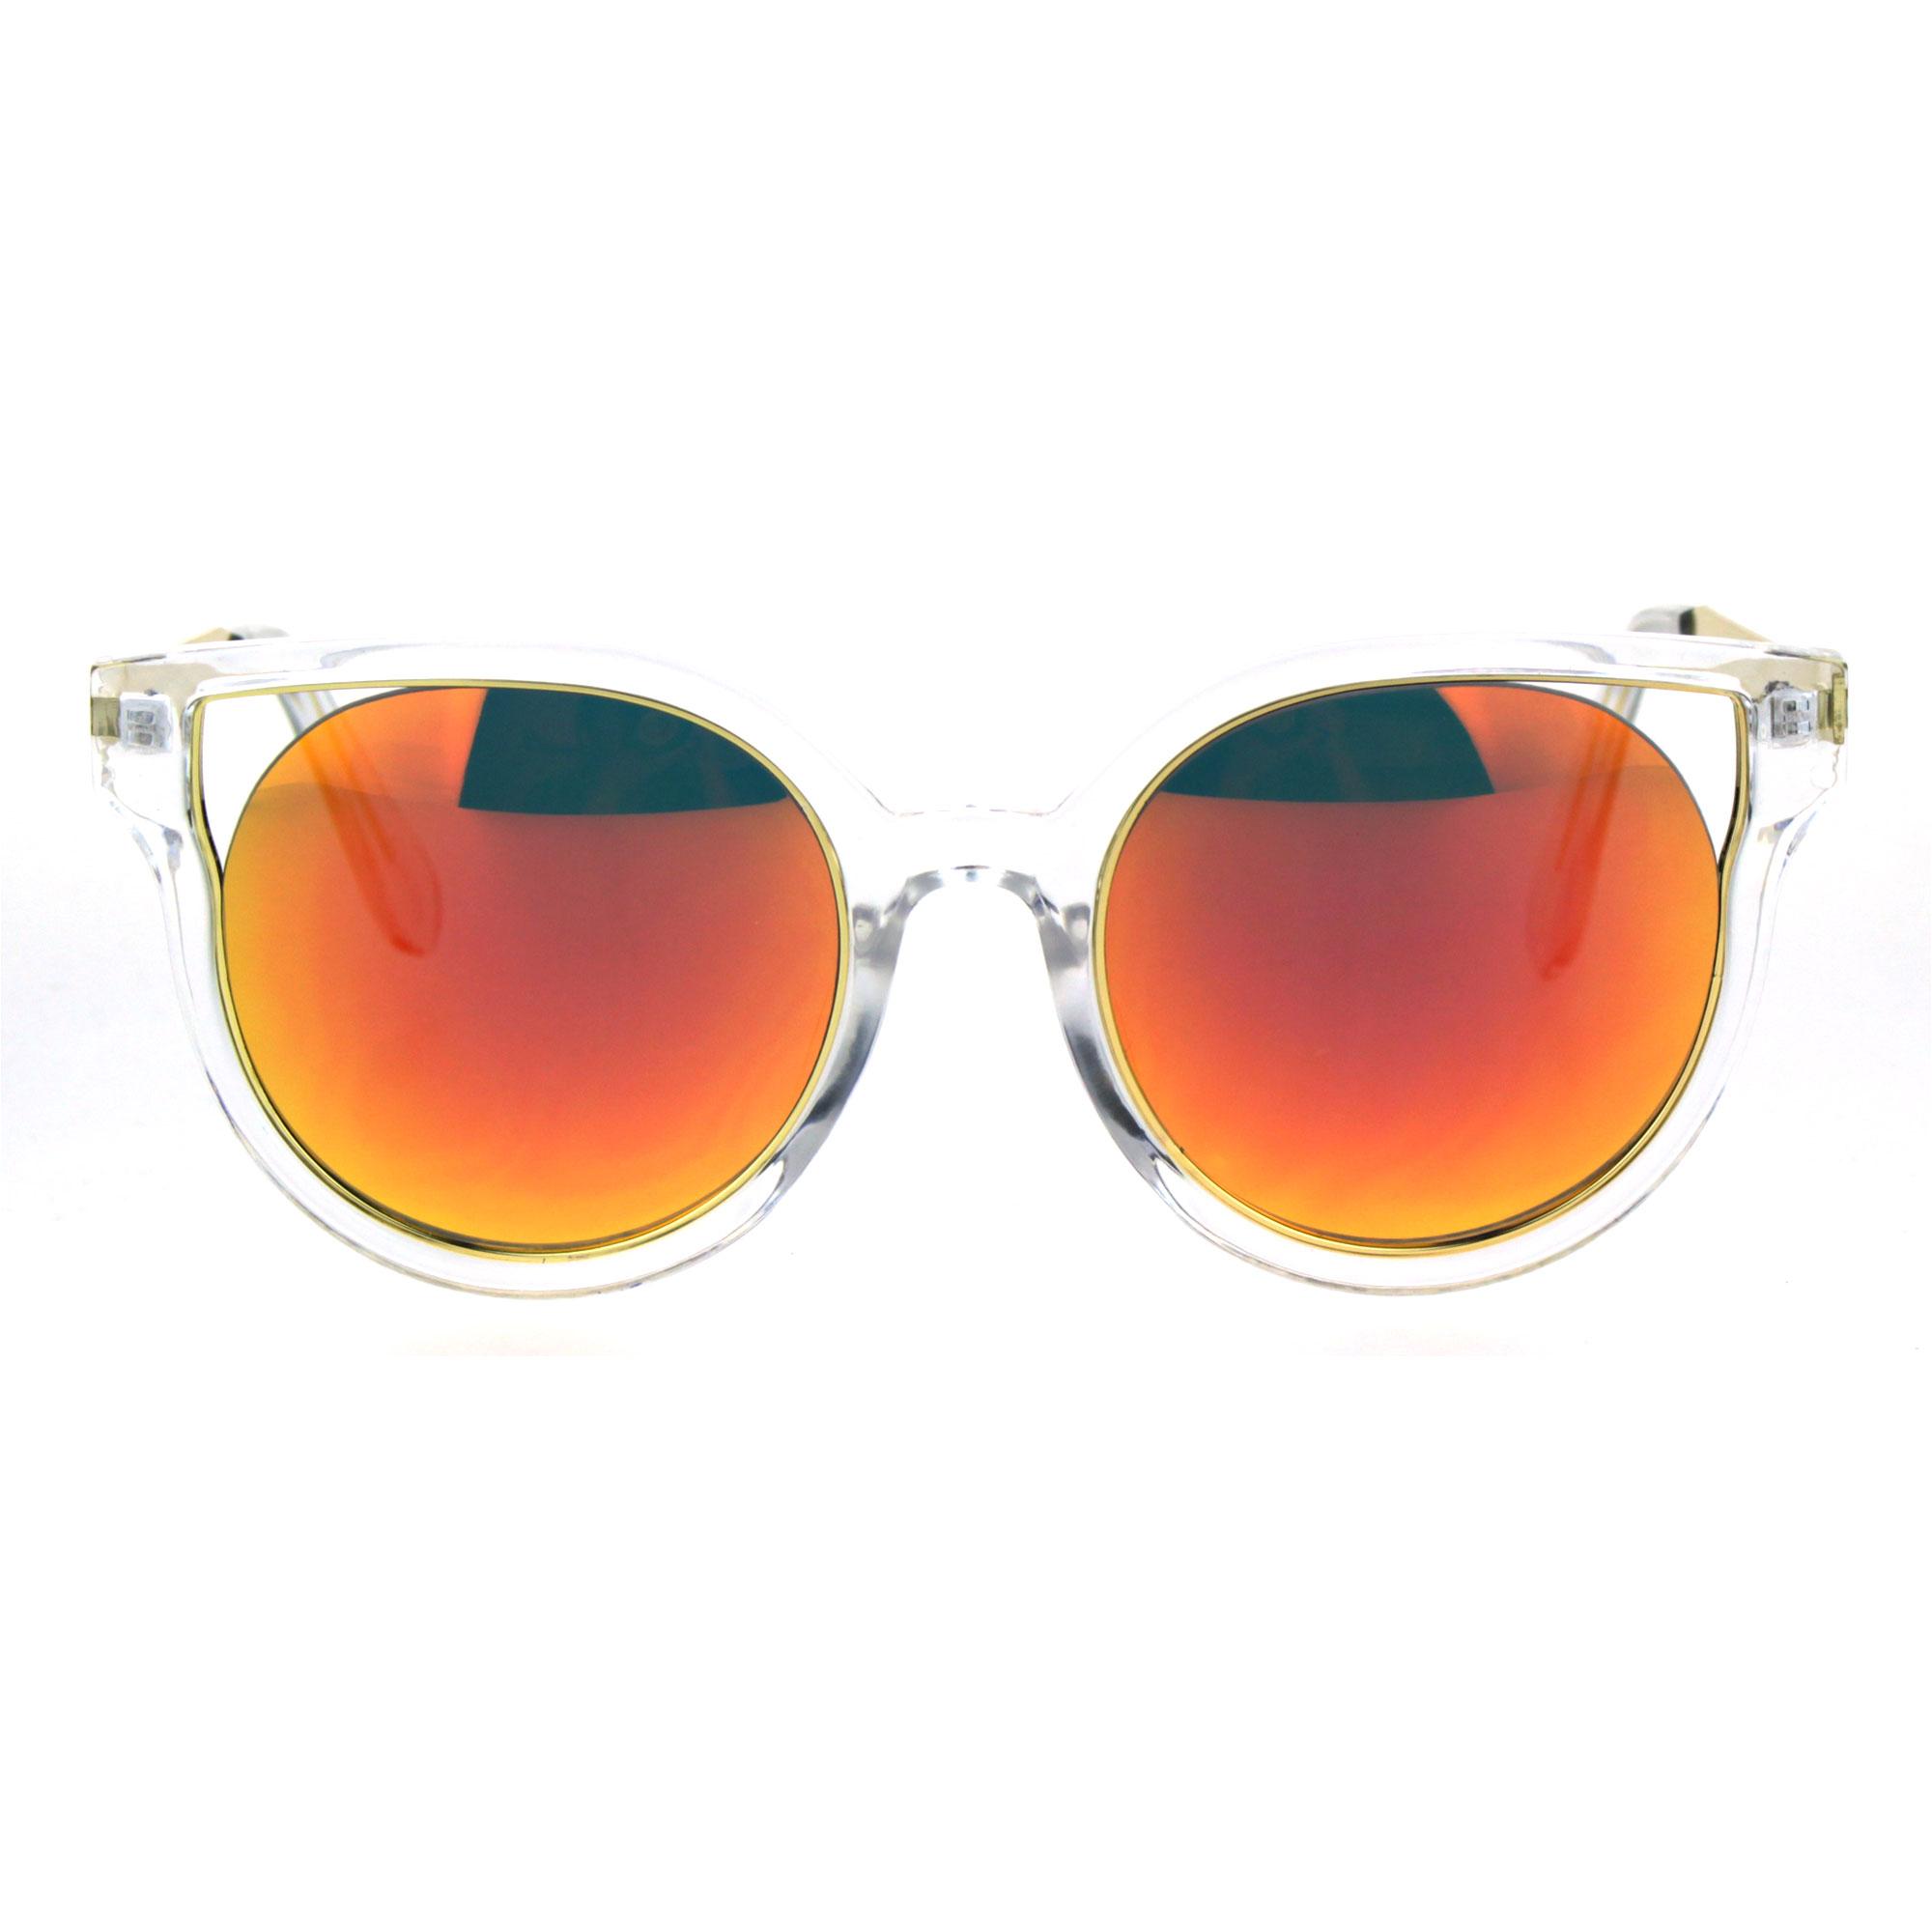 Large womens fashion oversized round circle sunglasses ebay - Womens Plastic Clear Horn Rim Cat Eye Round Retro Fashion